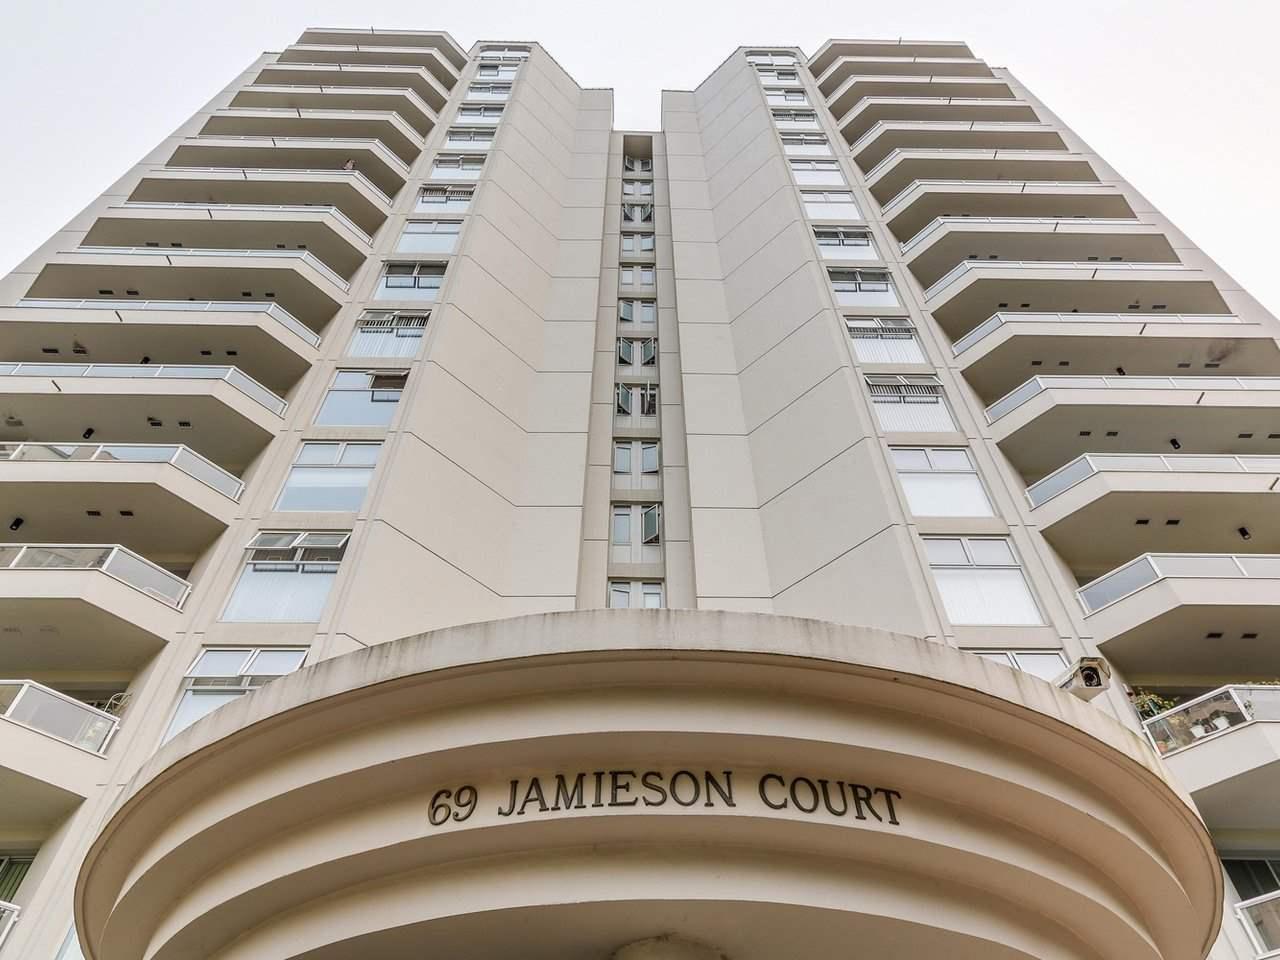 Condo Apartment at 1006 69 JAMIESON COURT, Unit 1006, New Westminster, British Columbia. Image 1